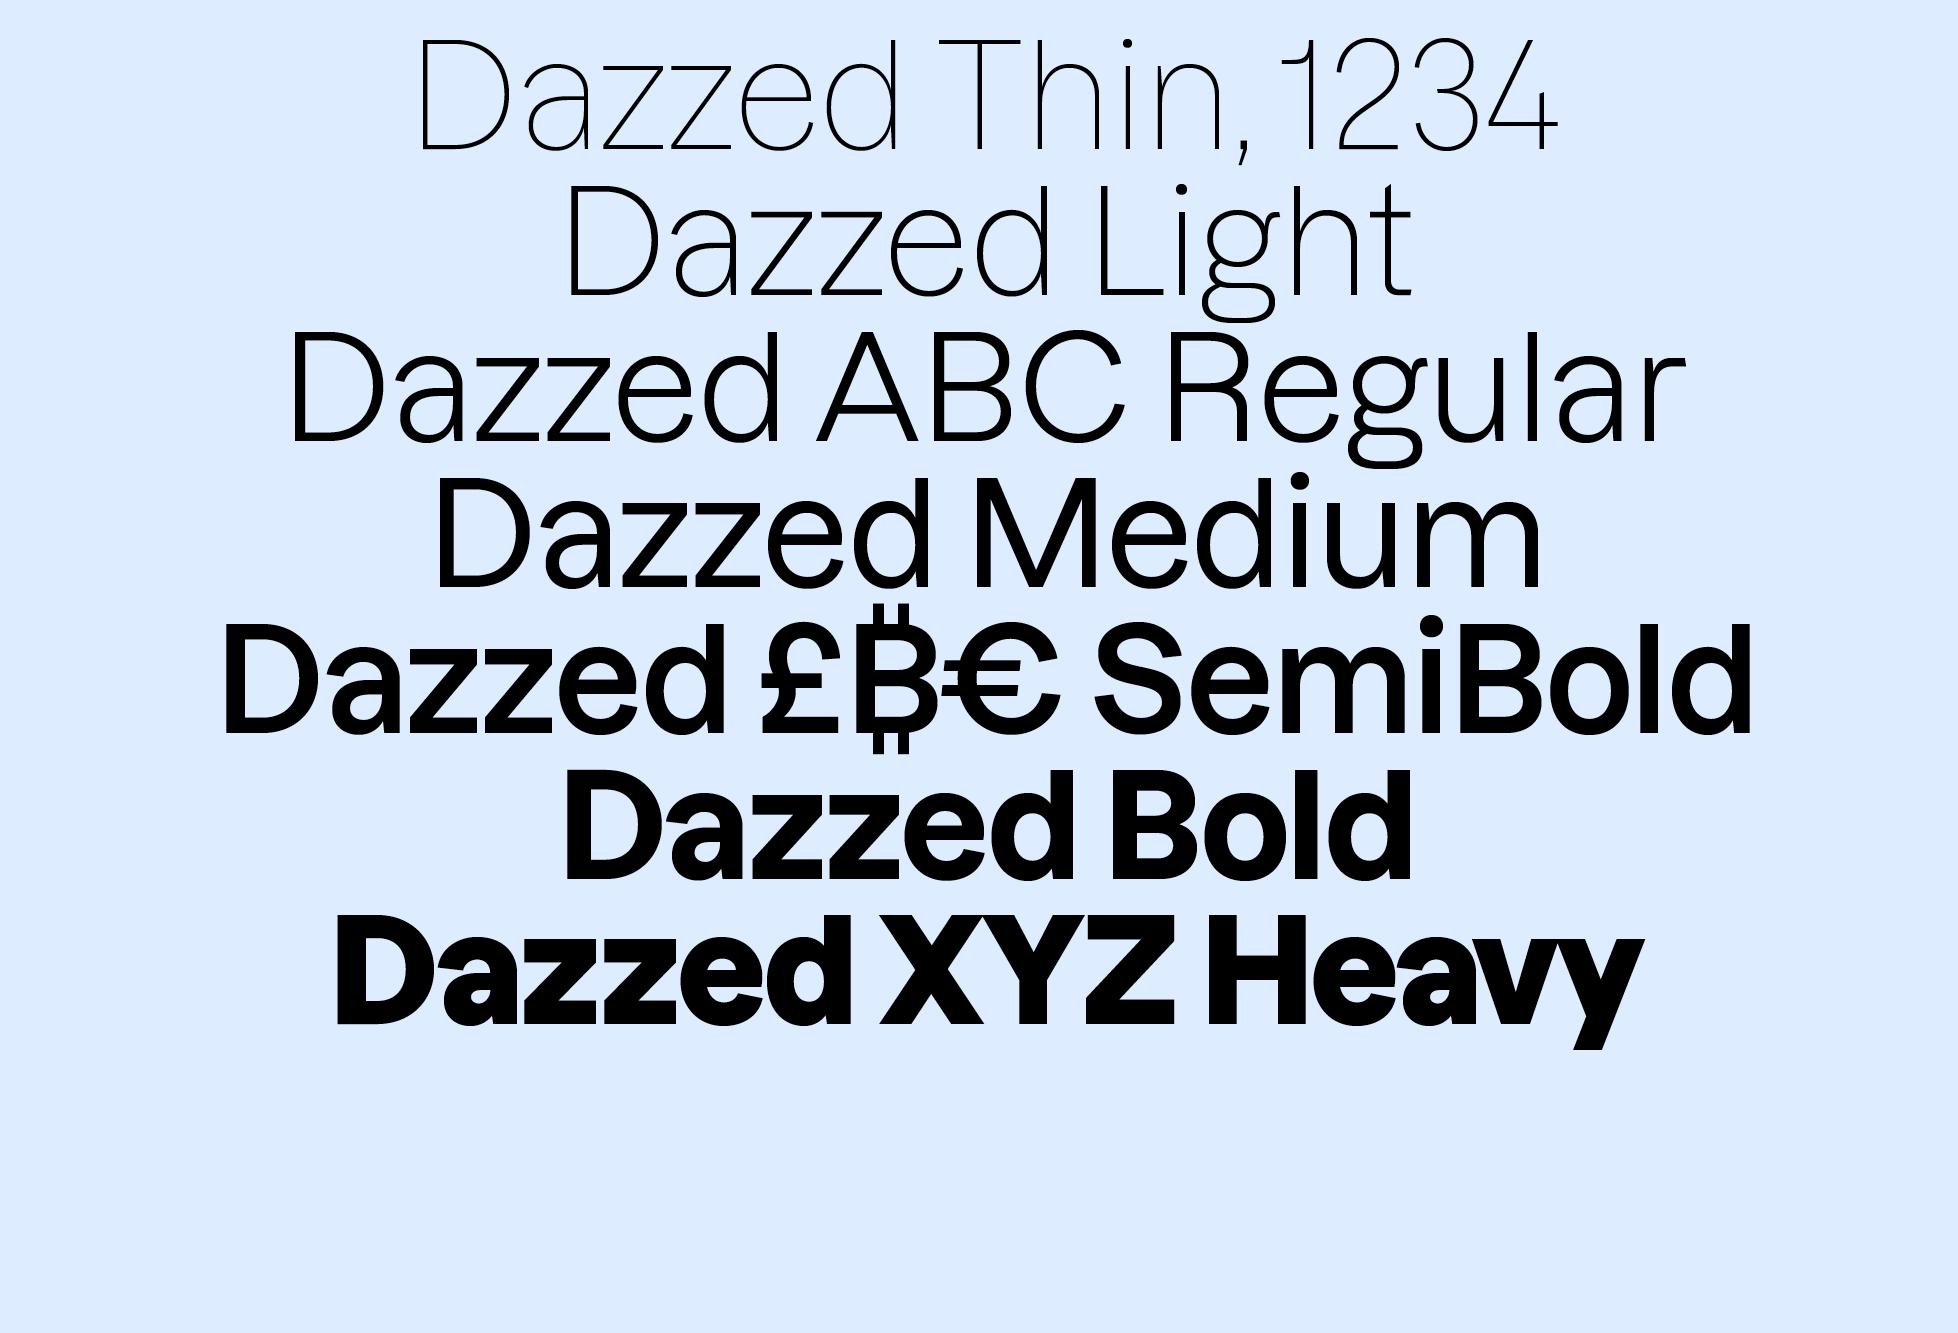 DP Dazzed 8